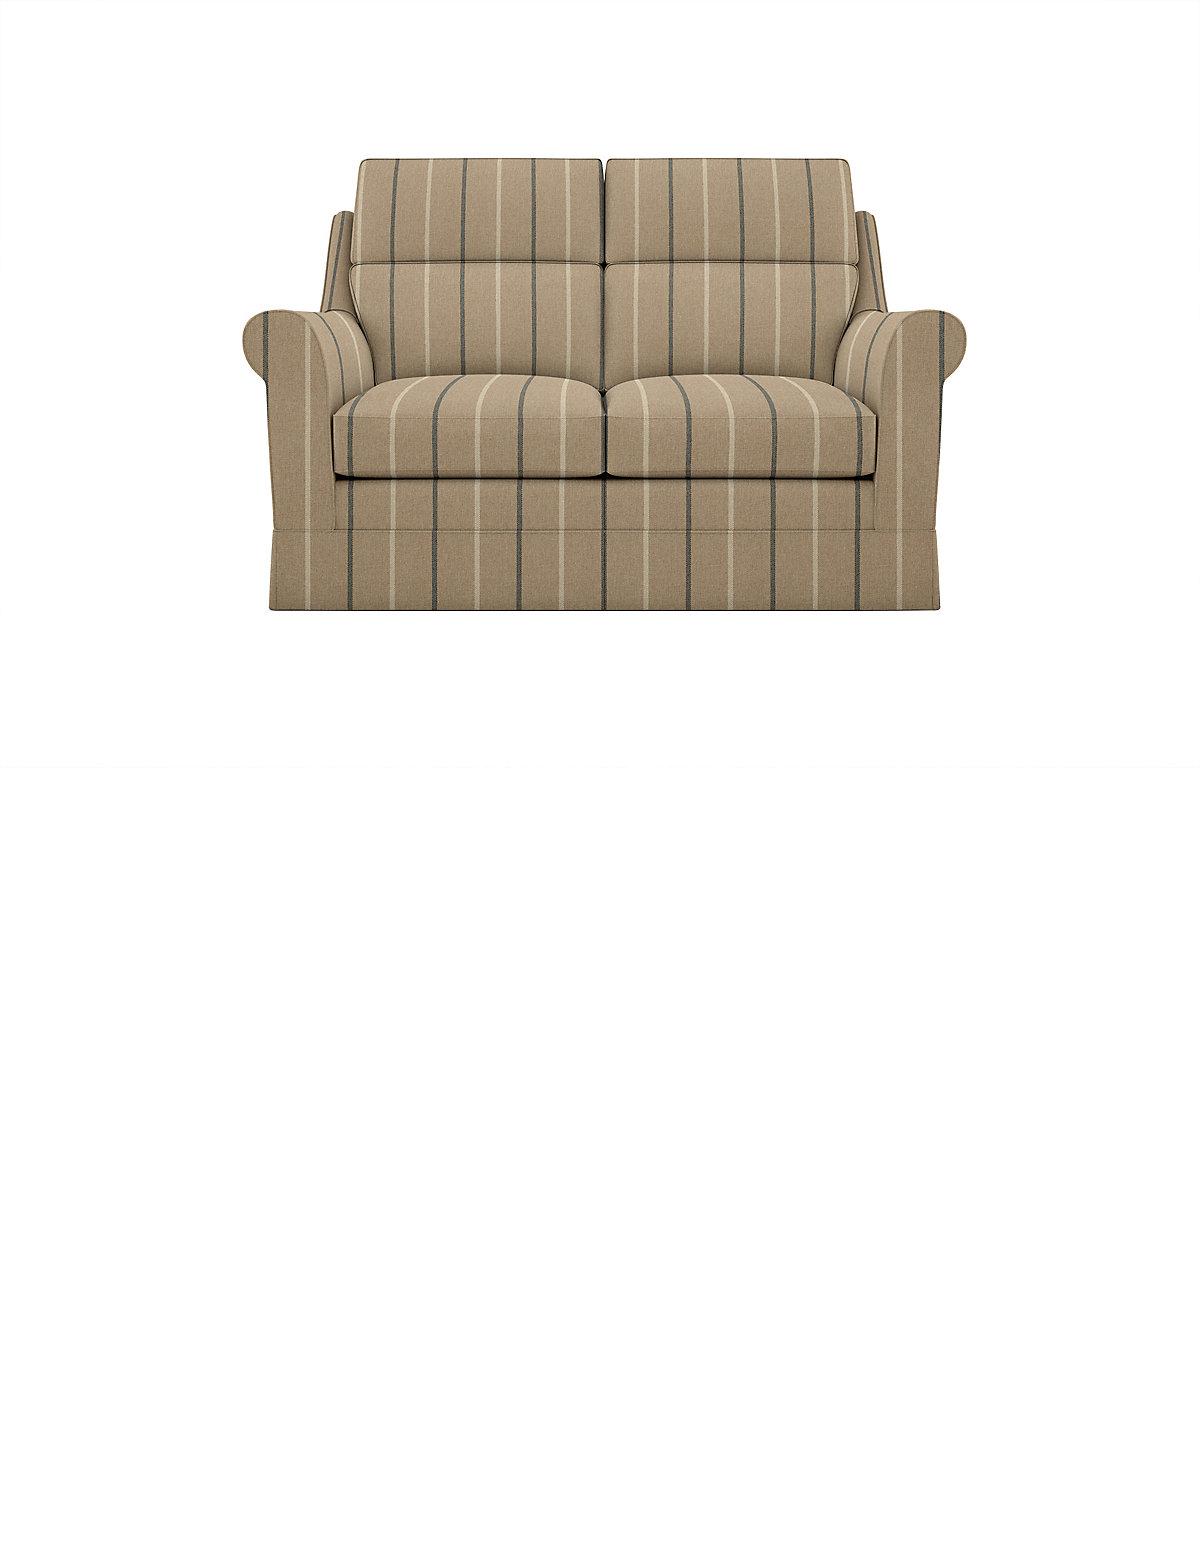 The Richmond High Back Compact Sofa